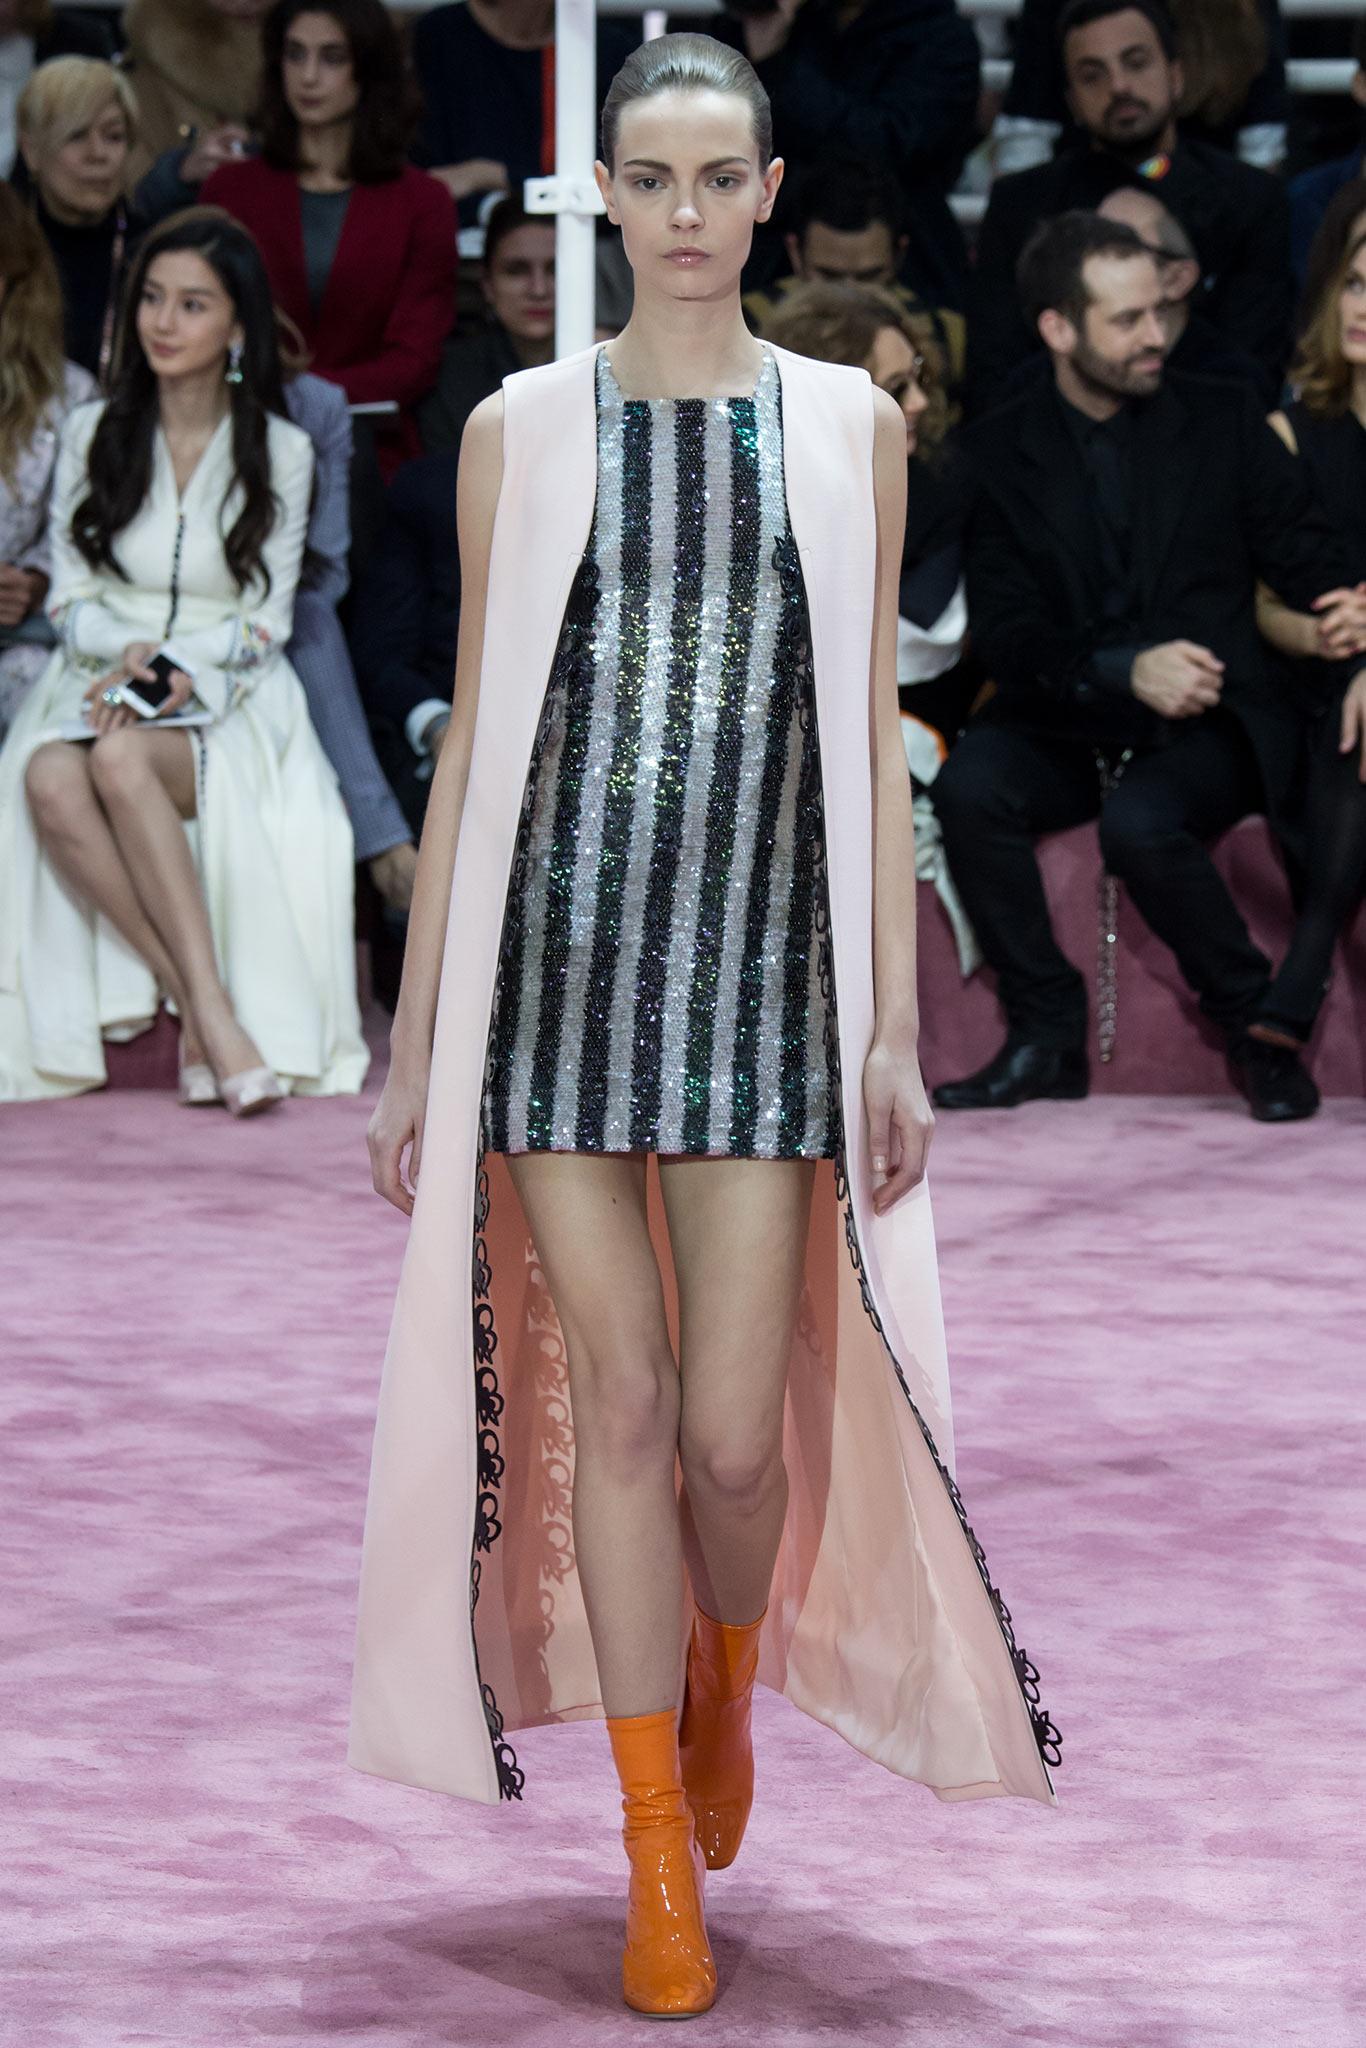 Christian Dior Haute Couture SS 2015 Paris